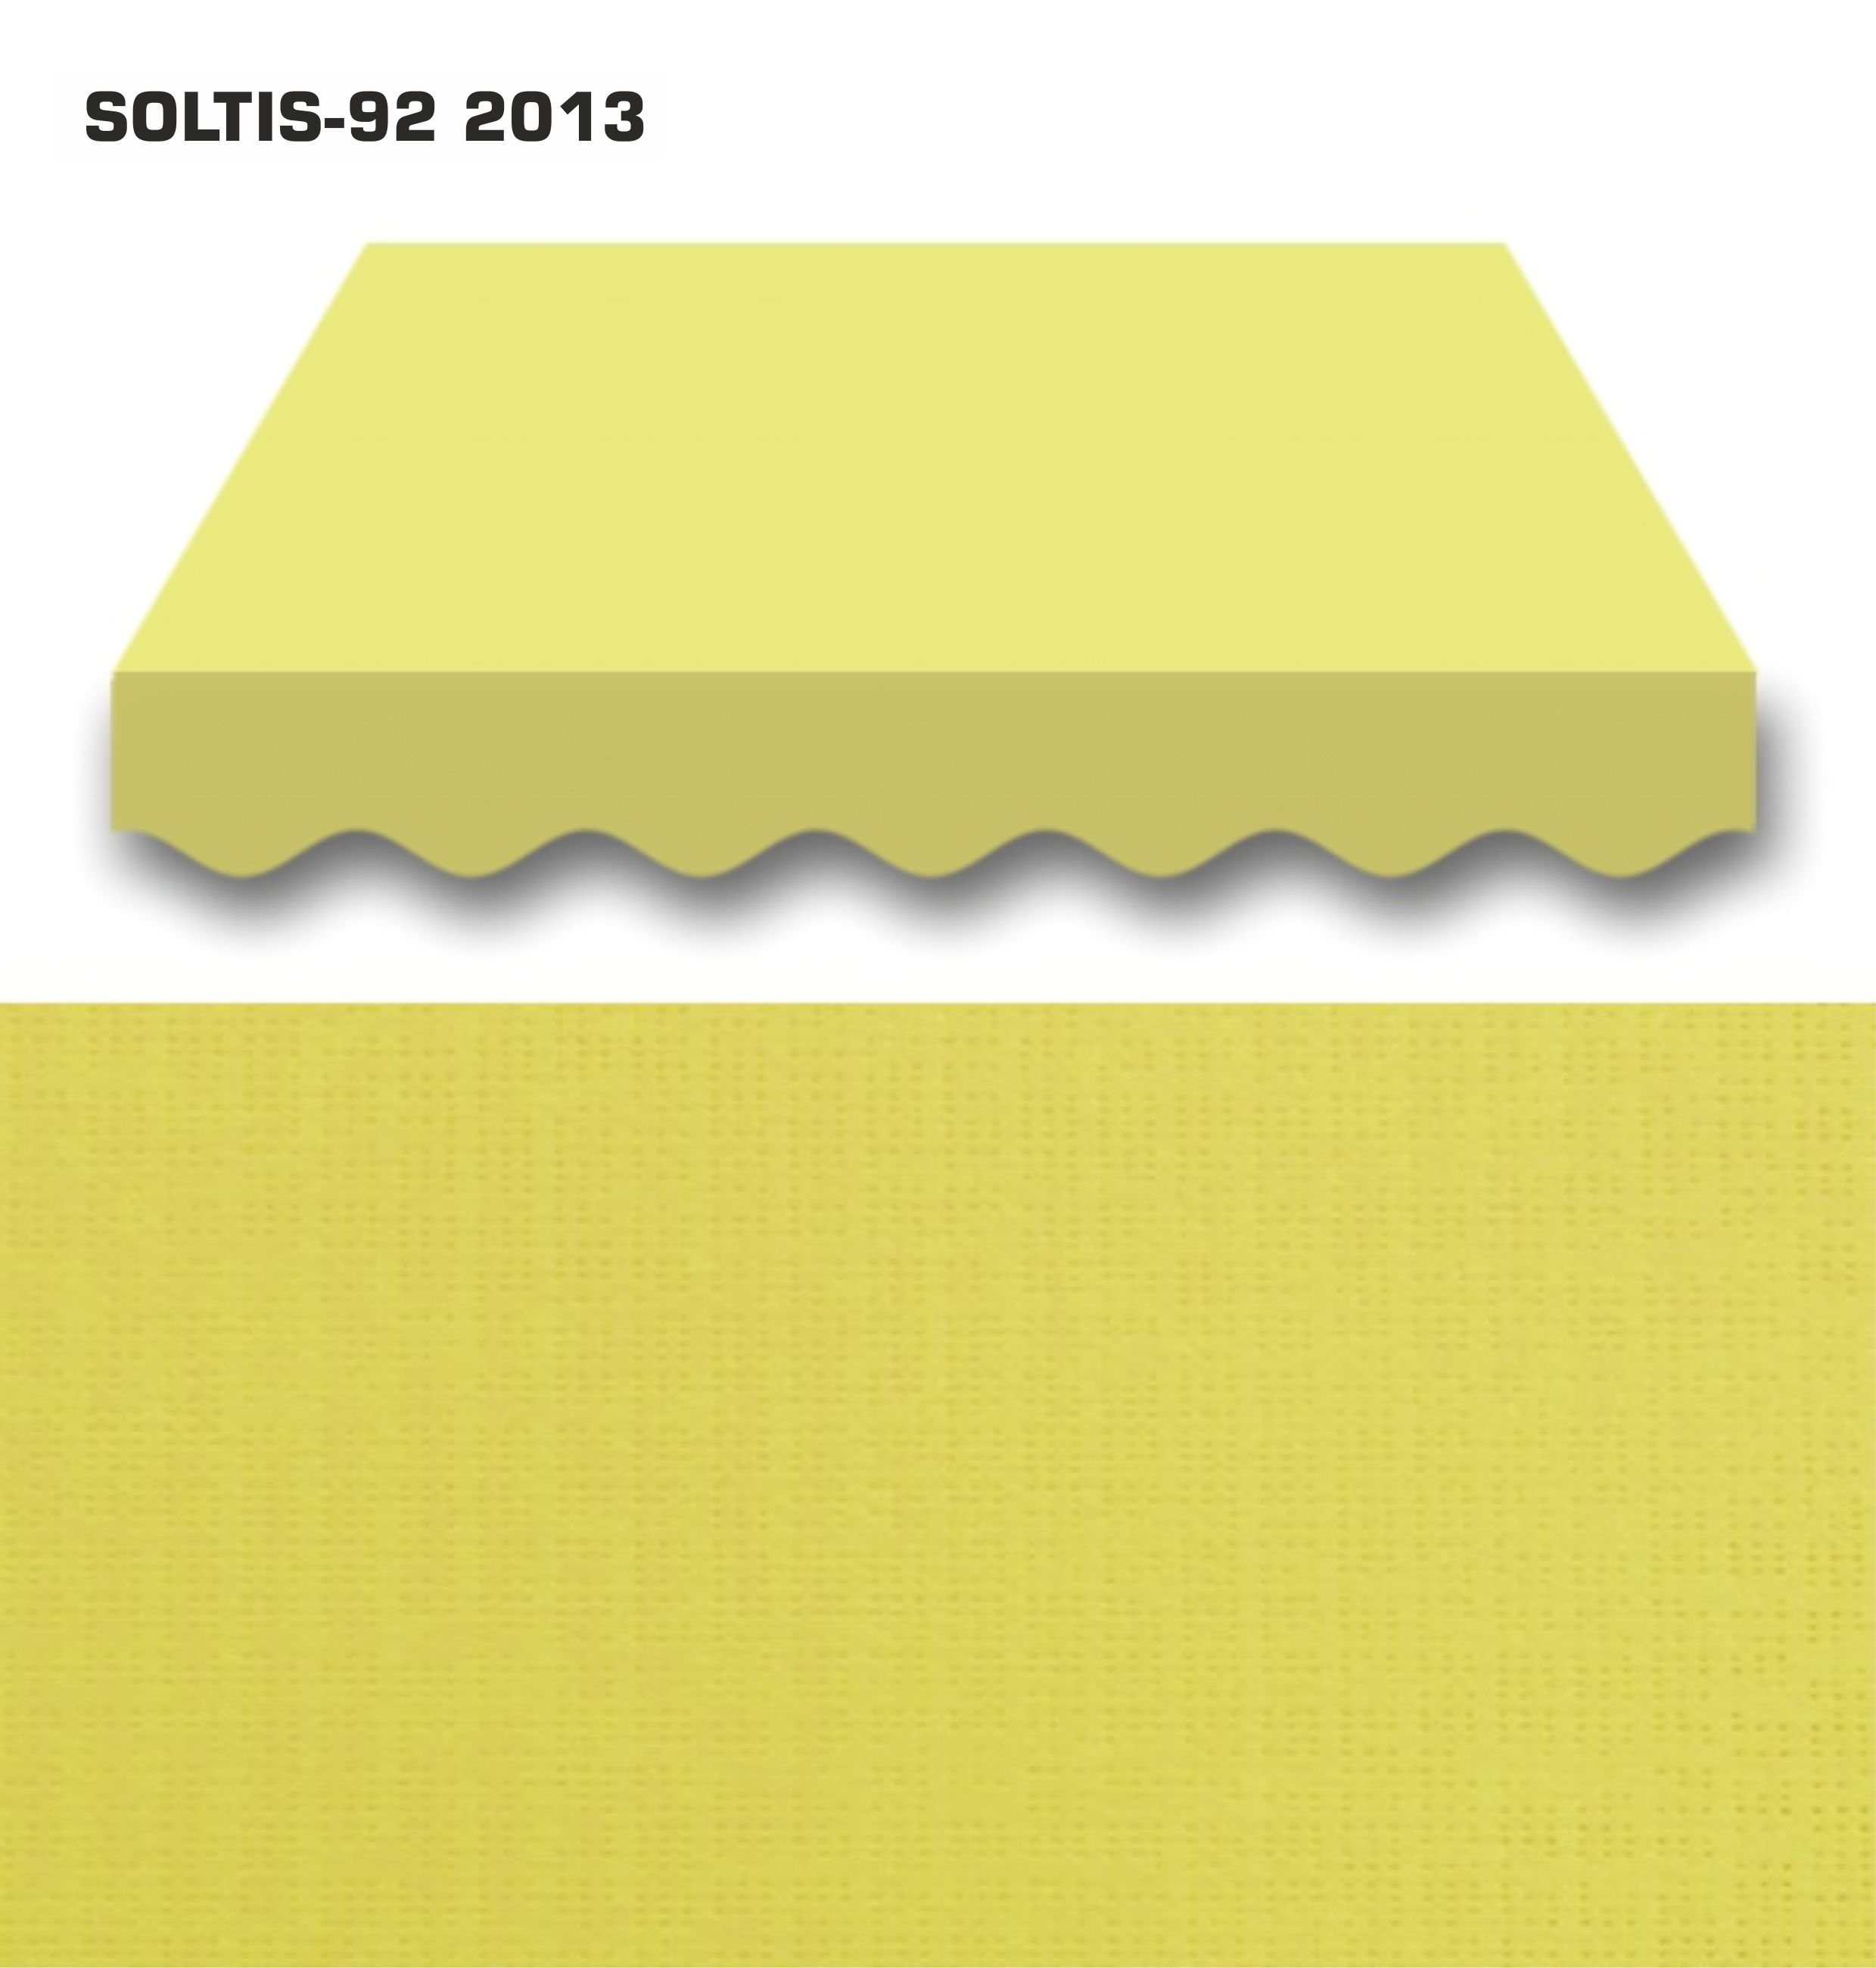 Soltis-92 2013